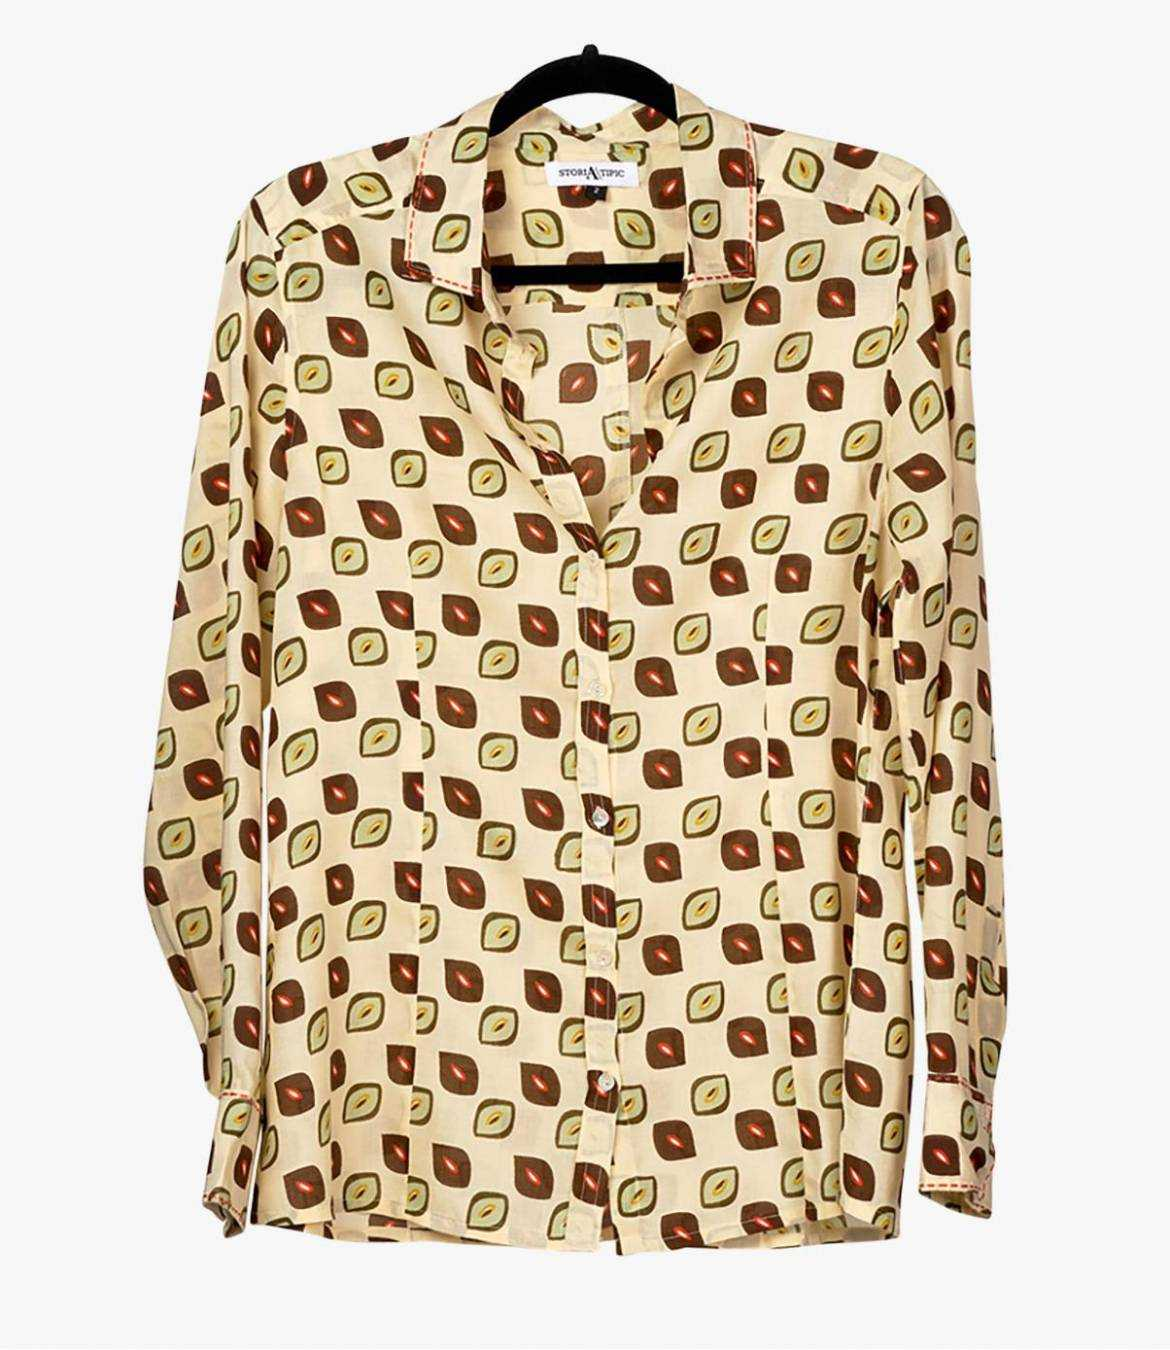 BONI CAFE Women's Modal Shirt Storiatipic - 2